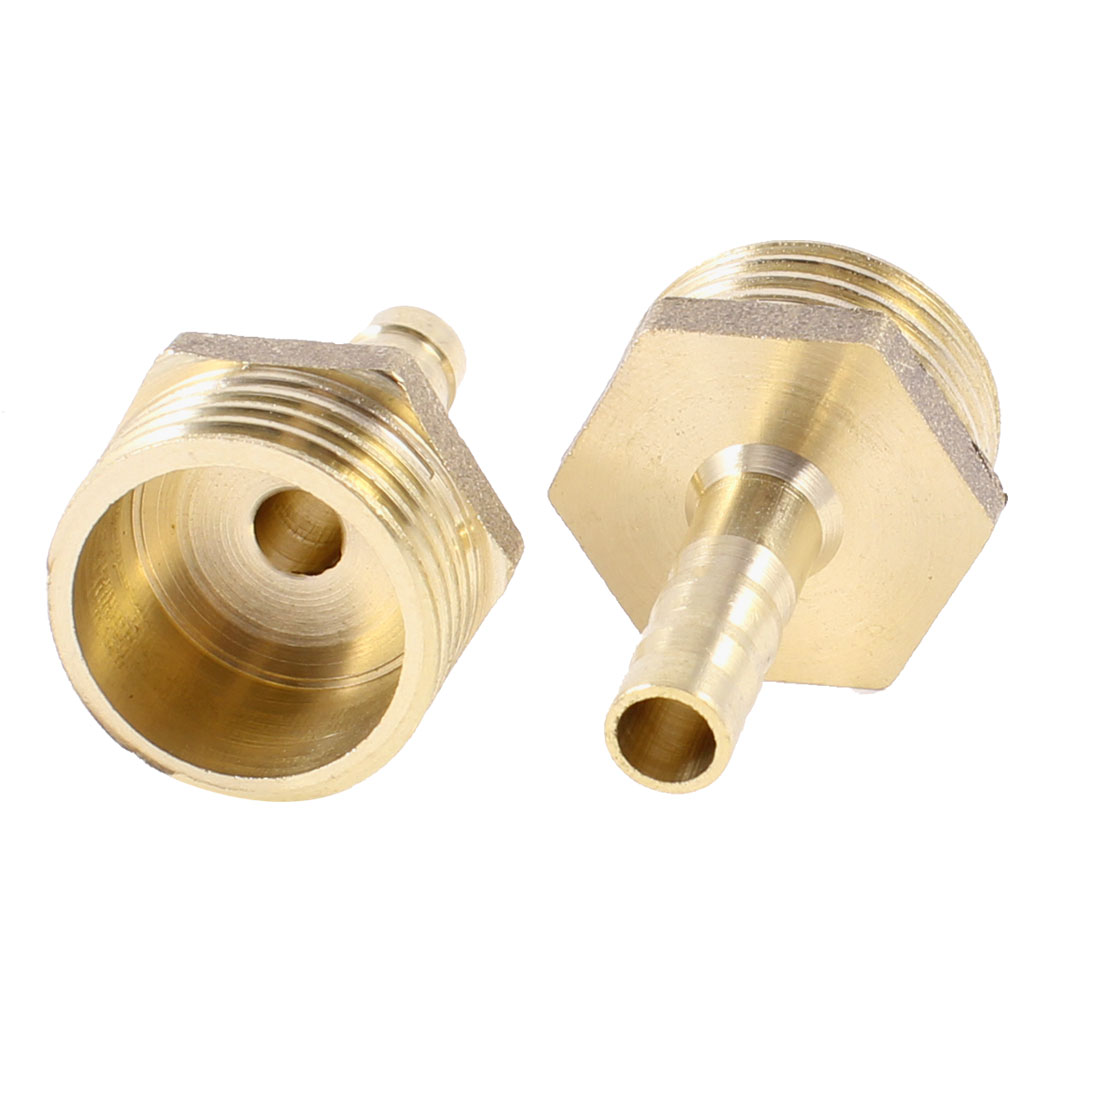 "Unique Bargains 2PCS Brass 6mm Hose Barb to 1/2""PT Male Thread Pneumatic Connector Couplers"